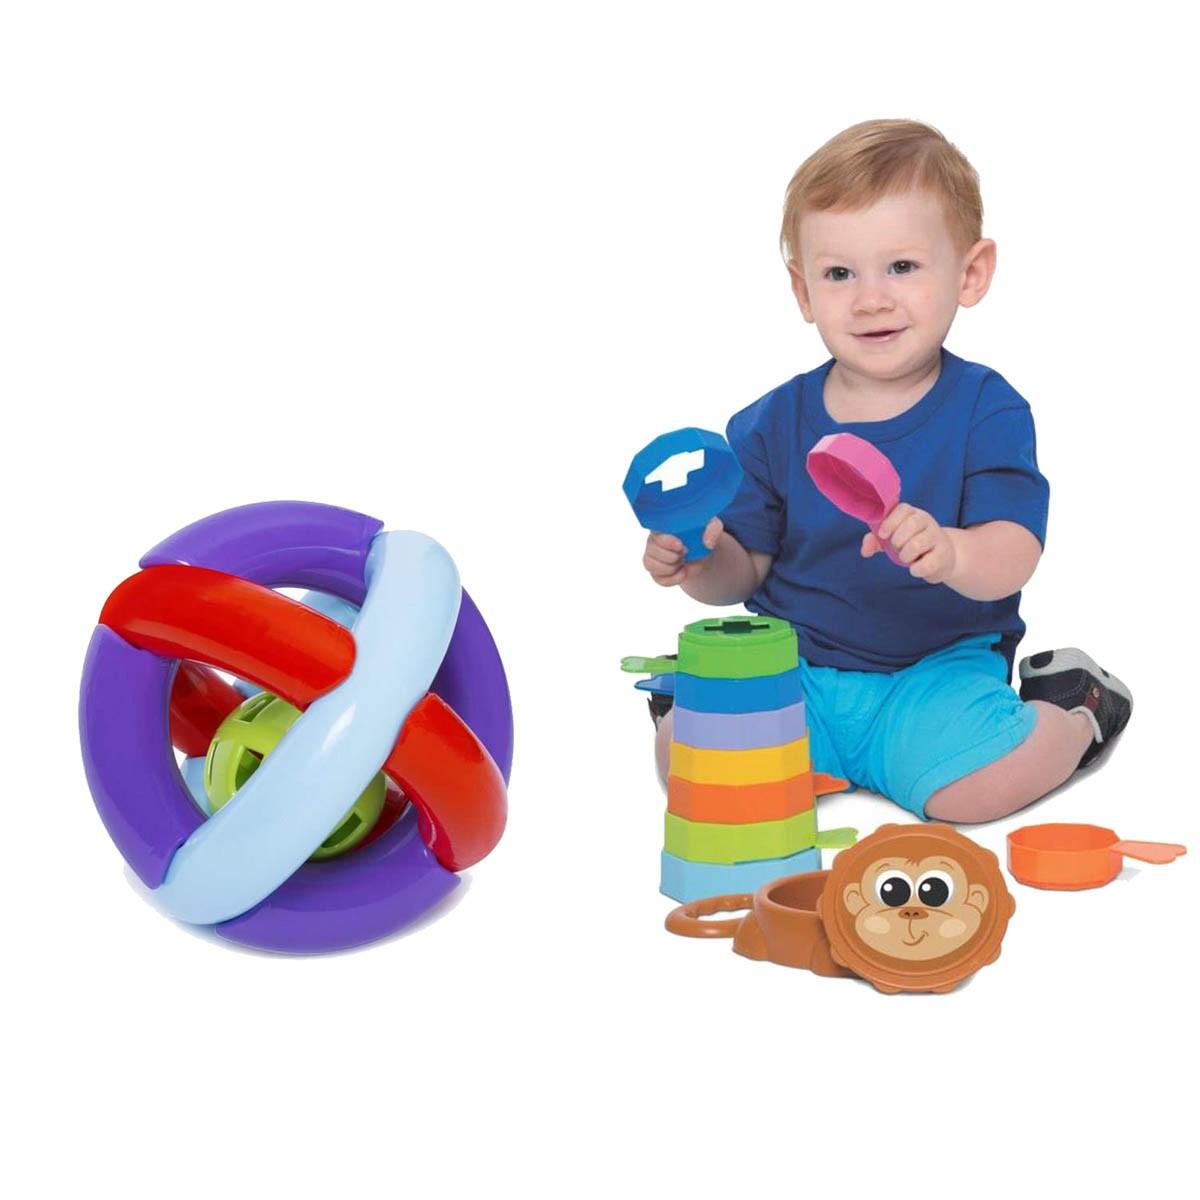 Kit de Brinquedos para Bebês de 6 meses